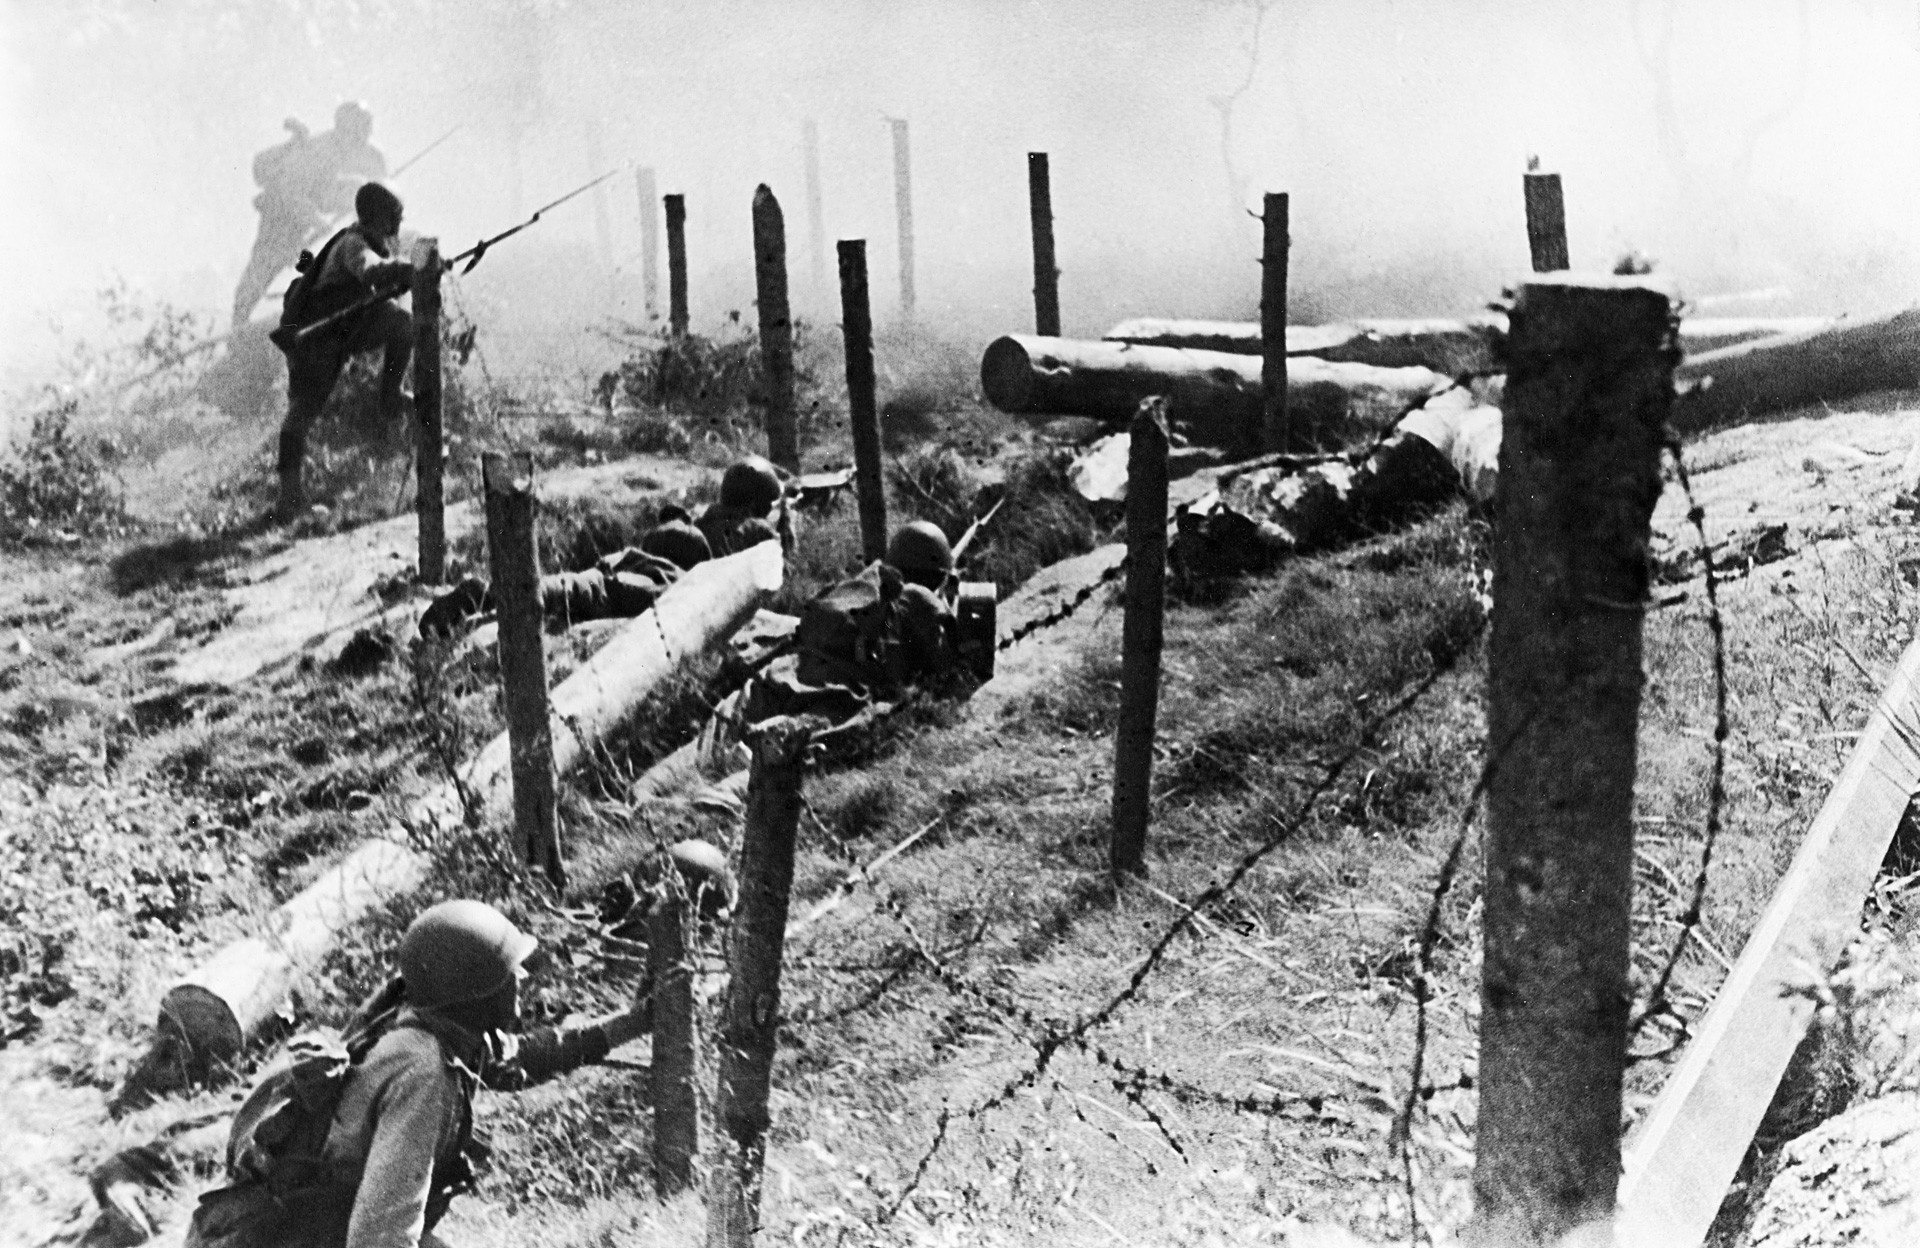 Tropas del Ejército Rojo asaltan un fuerte finés en el bosque, 1939.